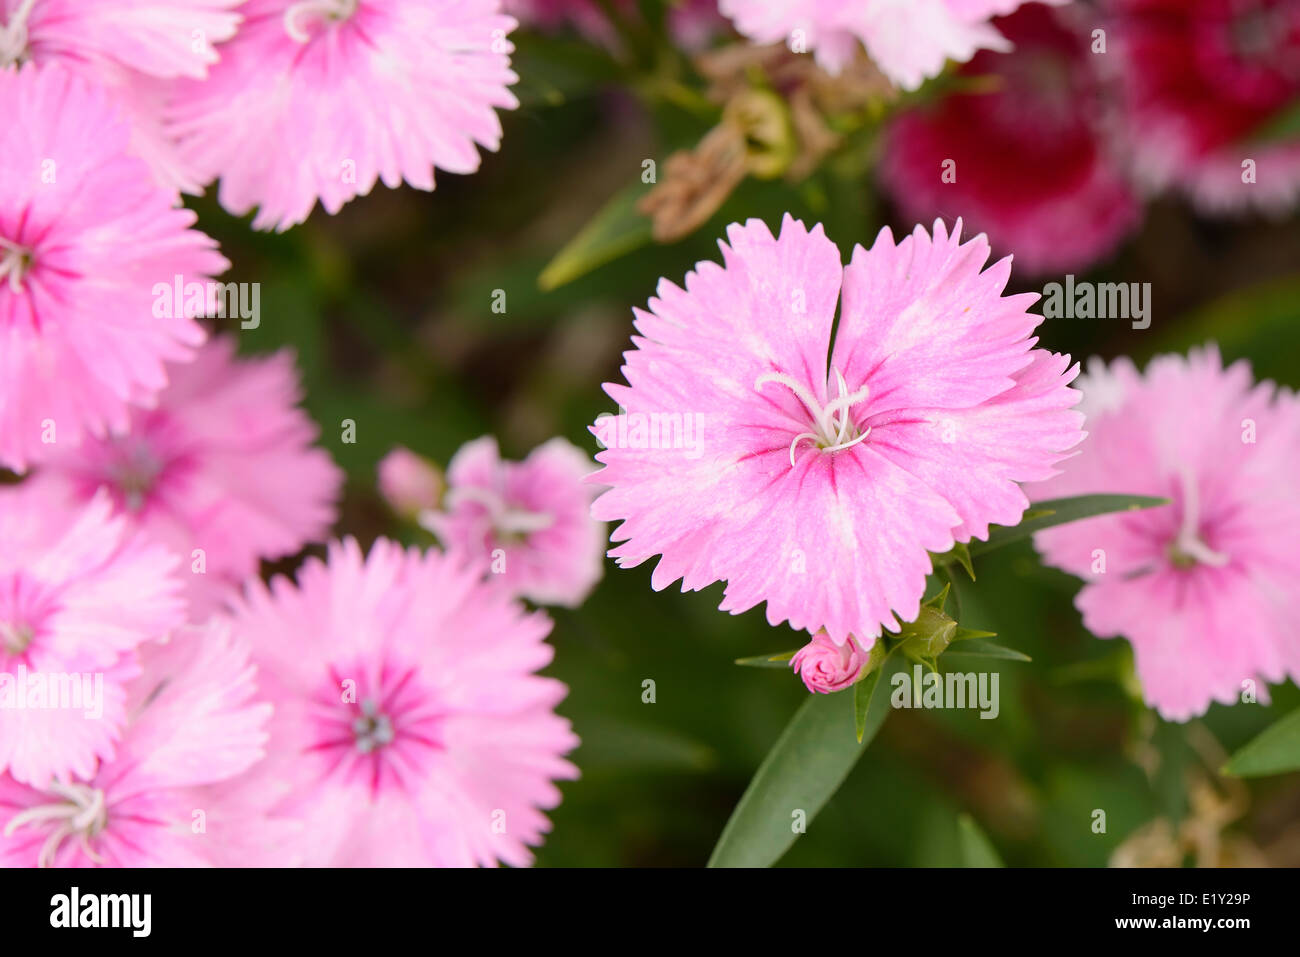 closeup of pink Dianthus barbatus flowers in a garden - Stock Image